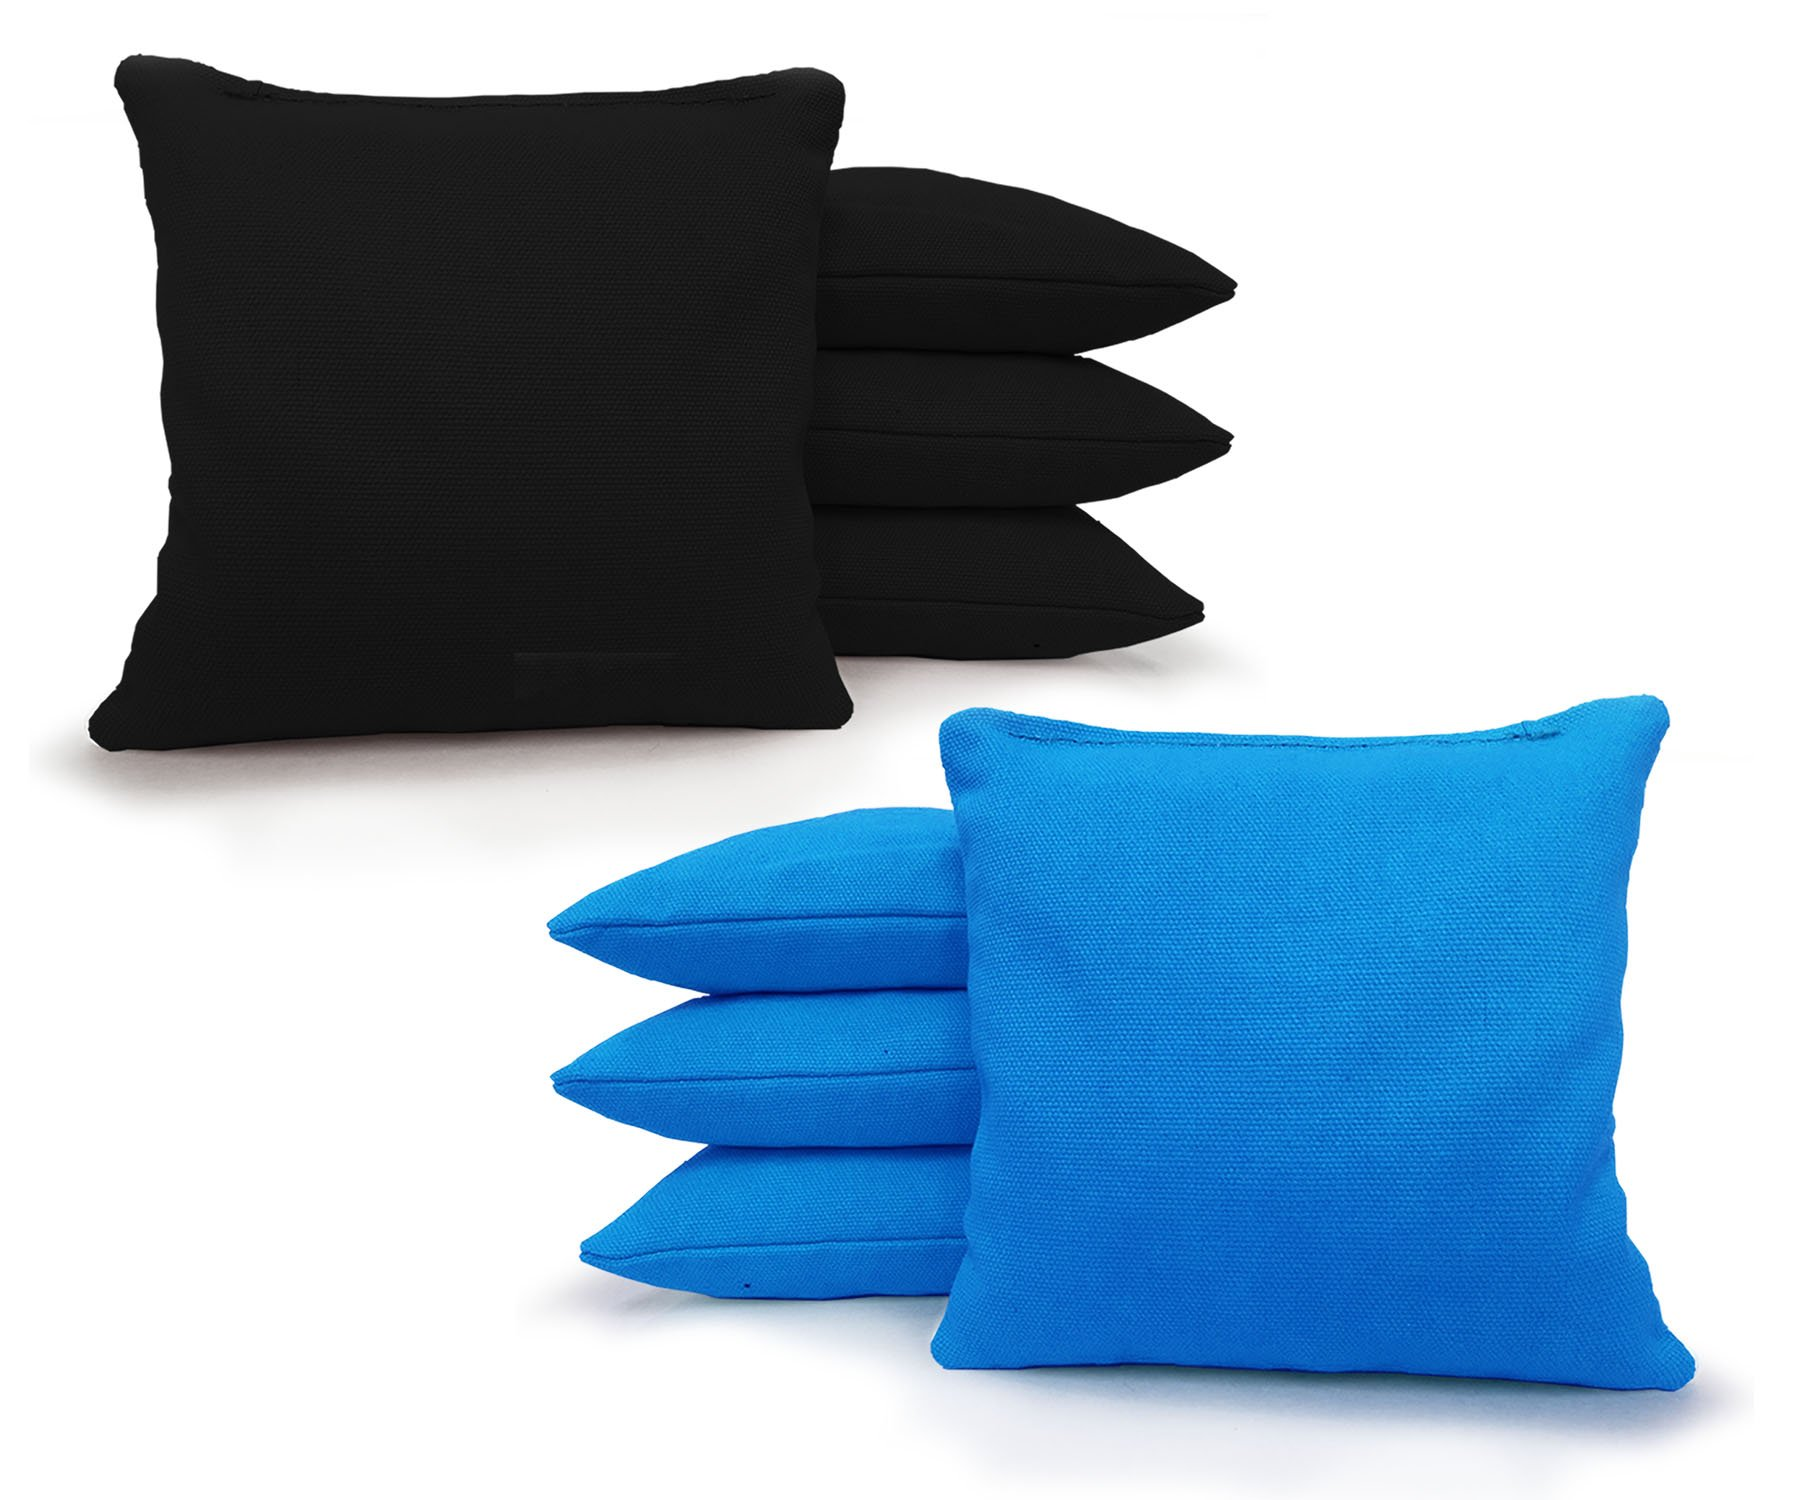 Tailgating Pros Regulation Cornhole Bags 17 Colors Handmade (Set of 8) by Johnson Enterprise, LLC (Black/Turquoise) by Tailgating Pros